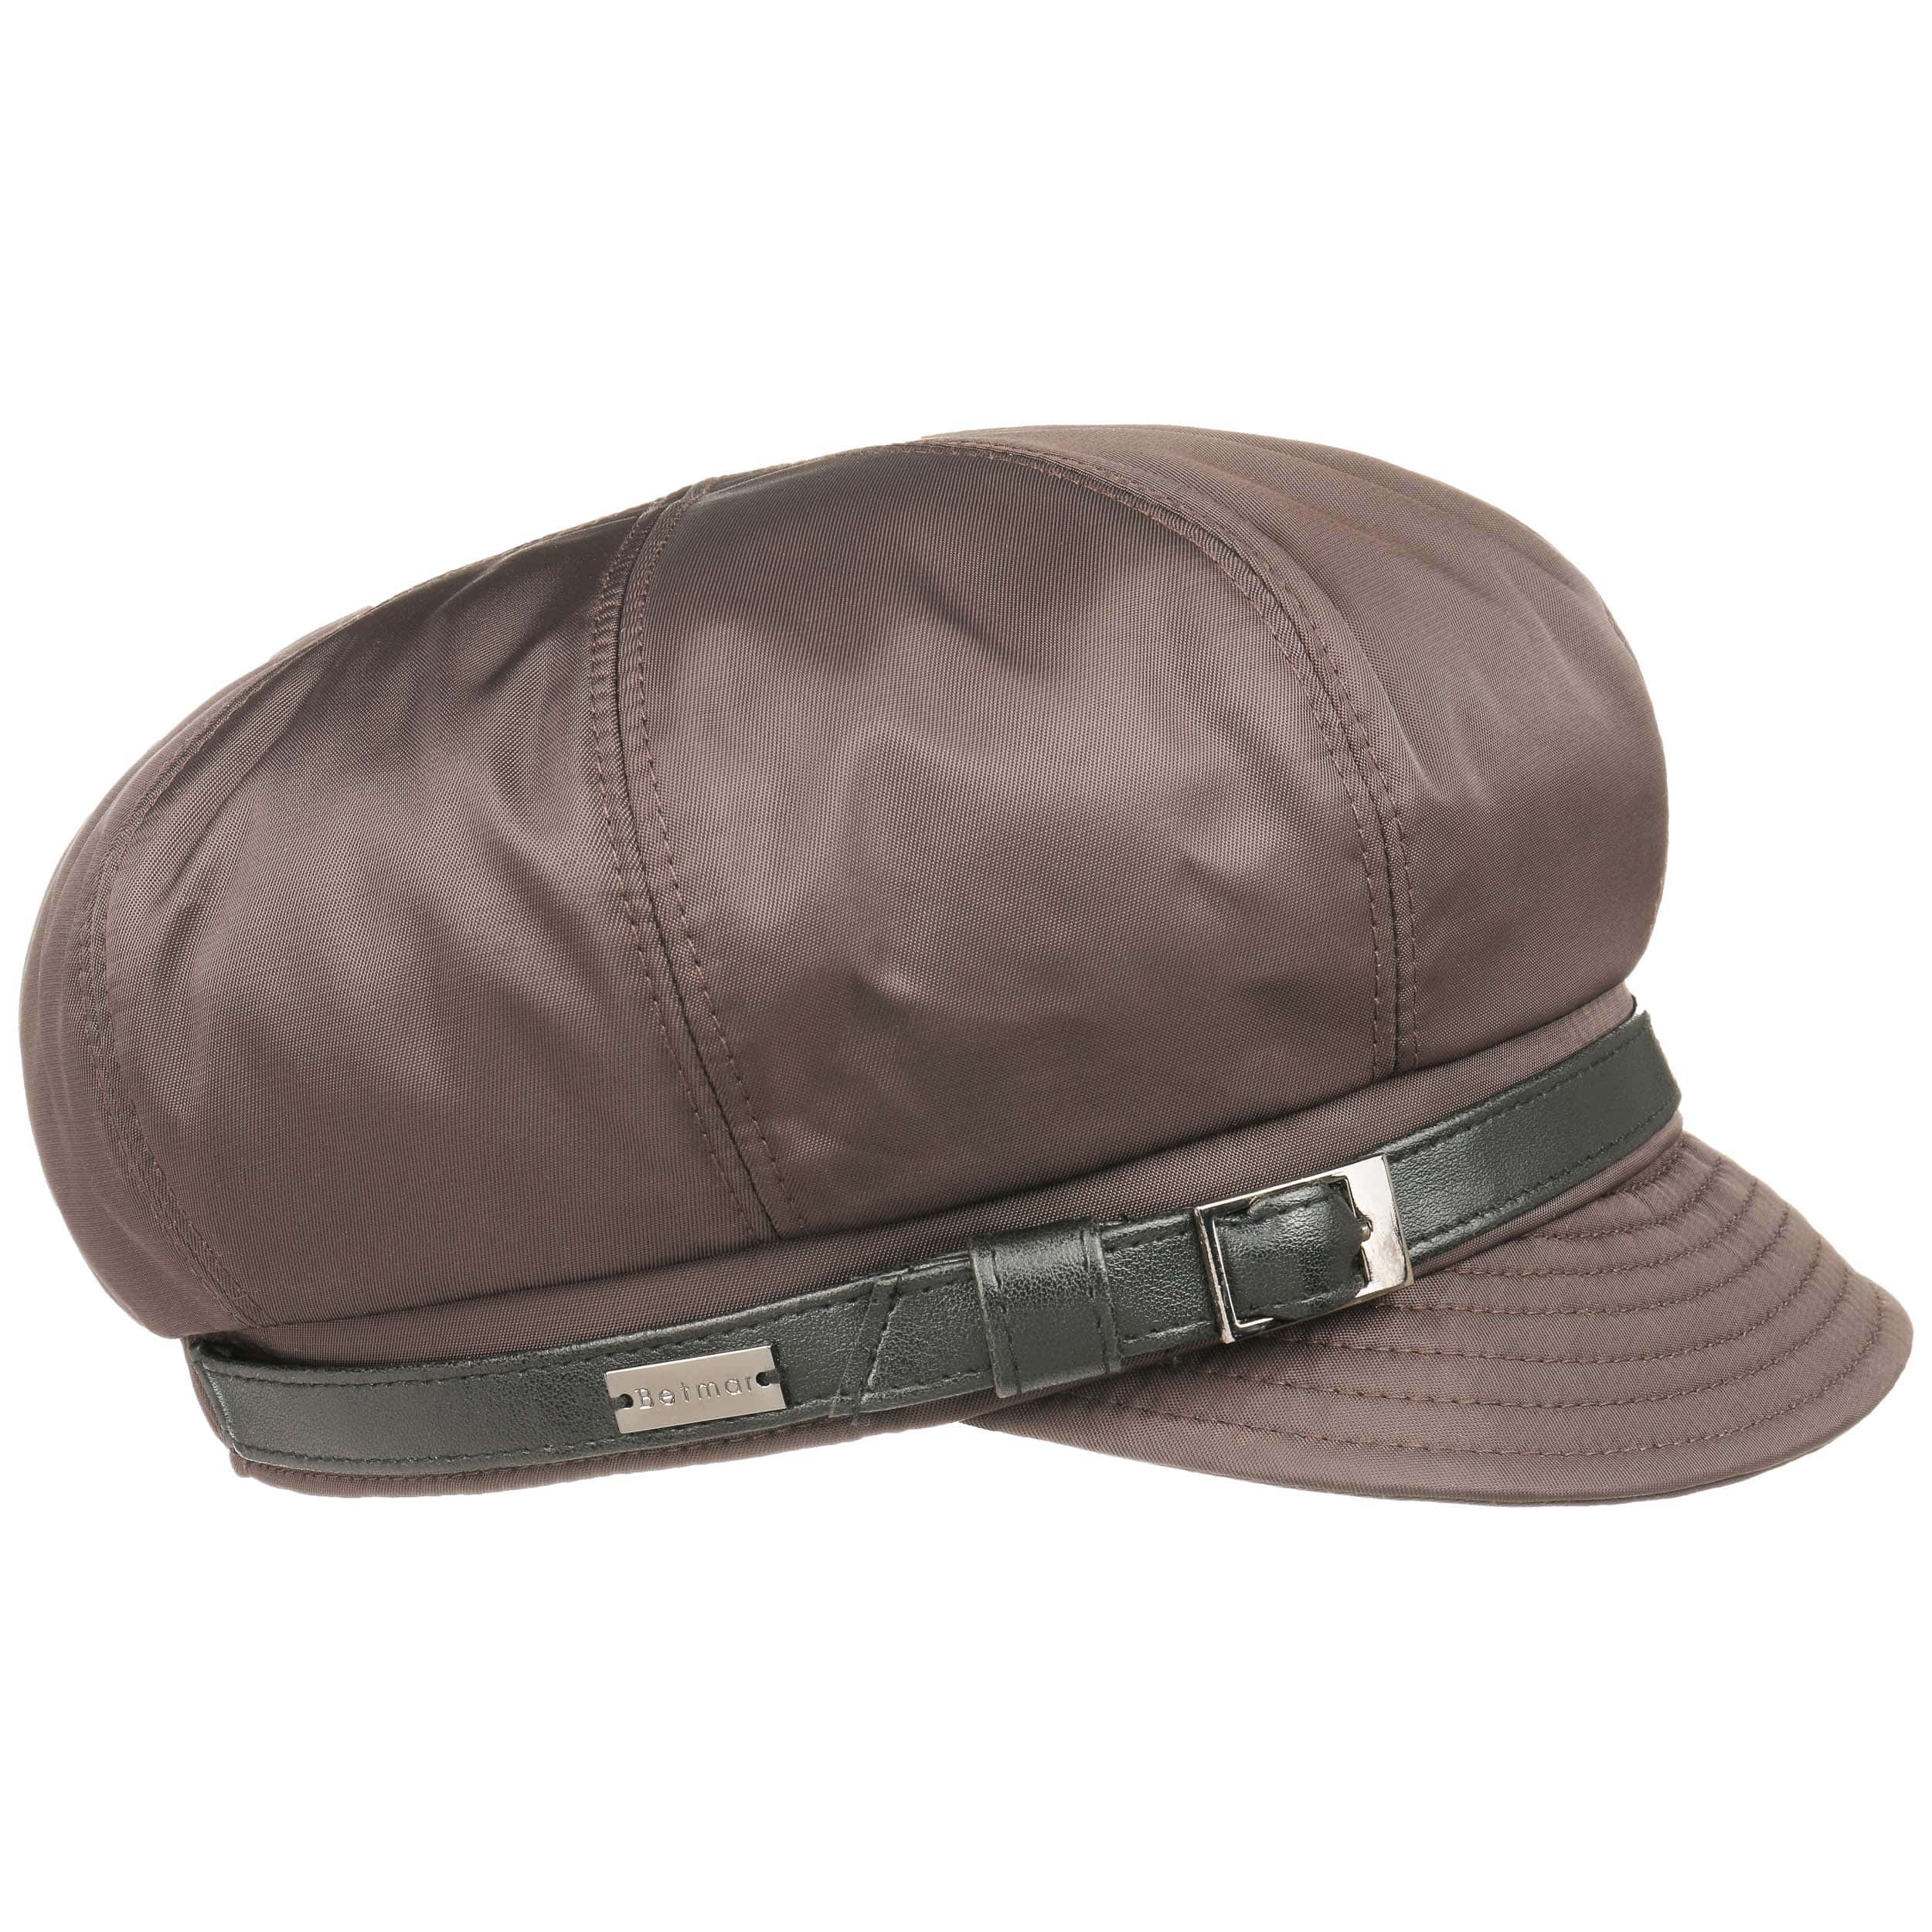 57877afa1edf8 ... Newsboy Caps For Women: Fern Women´s Newsboy Cap By Betmar, GBP 45